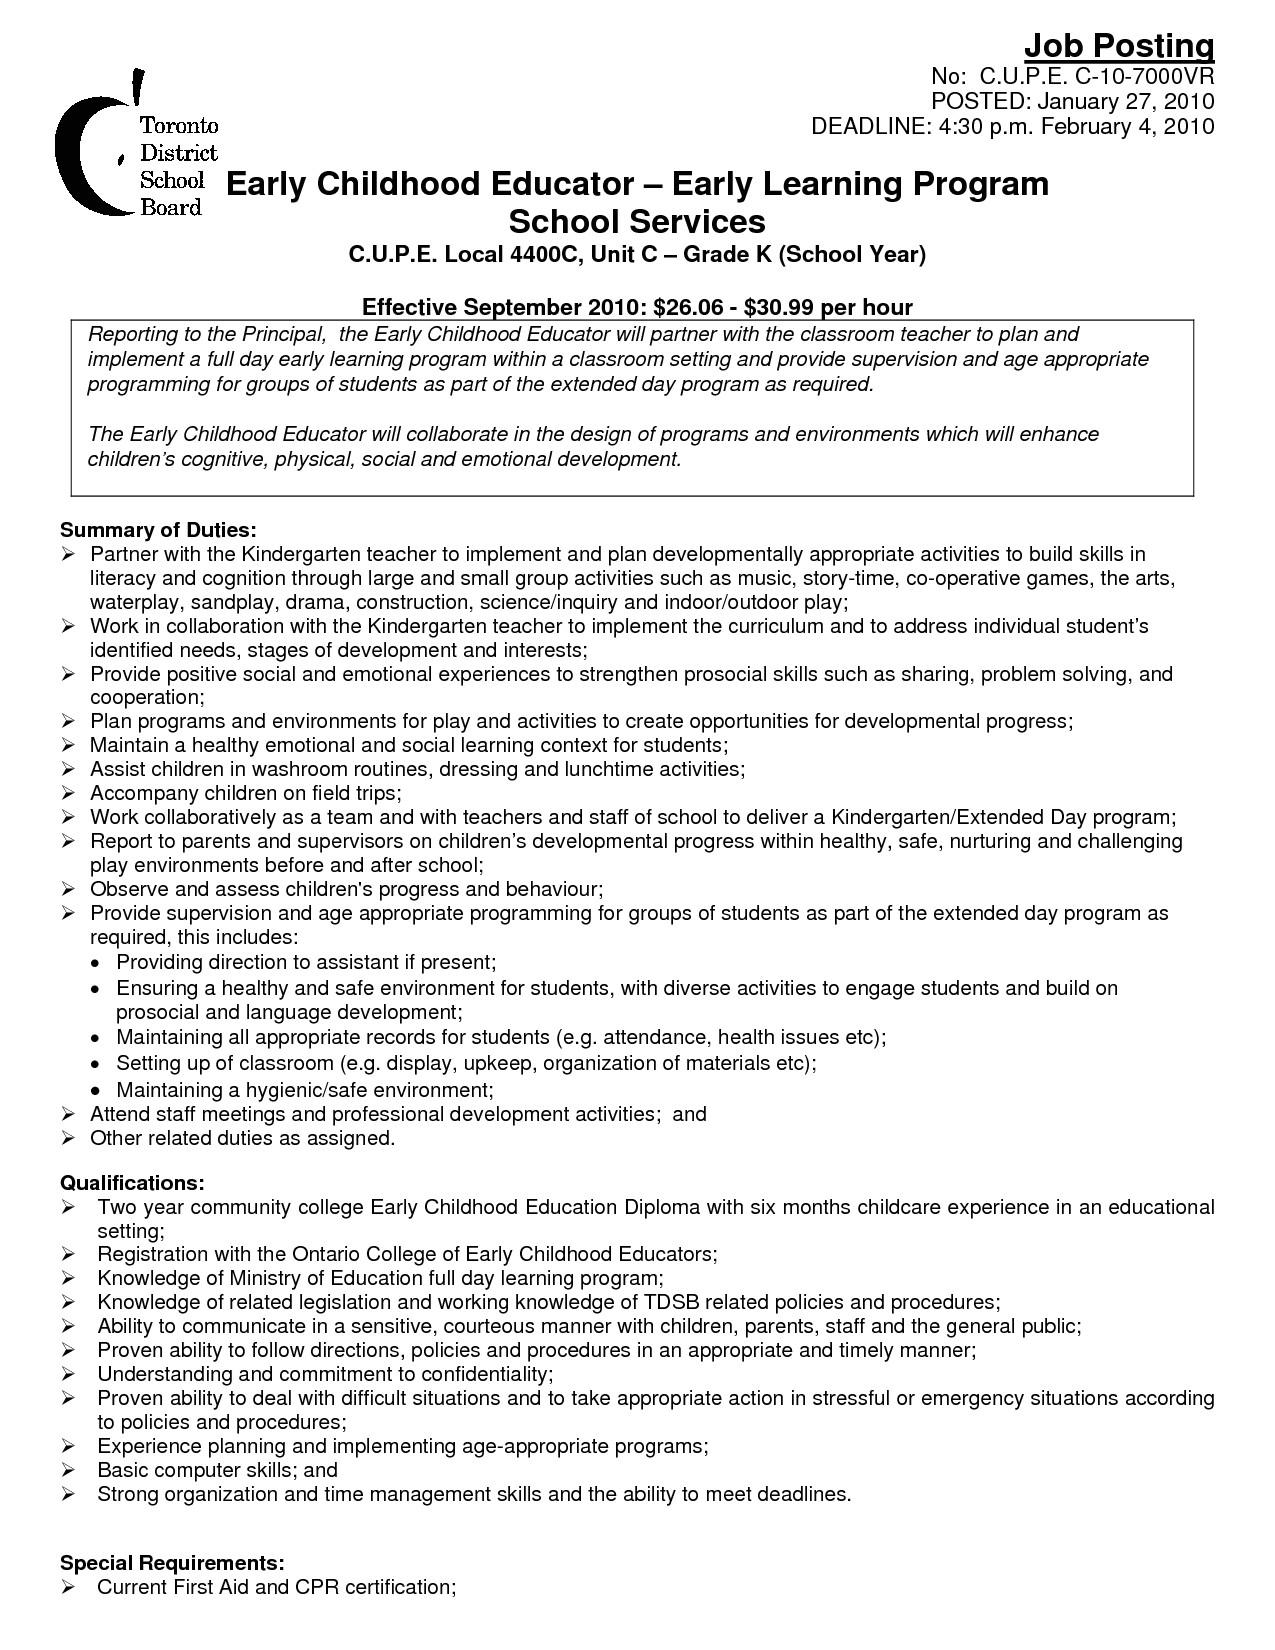 Sample Resume for Early Childhood Educator Early Childhood Education Resume Suiteblounge Com